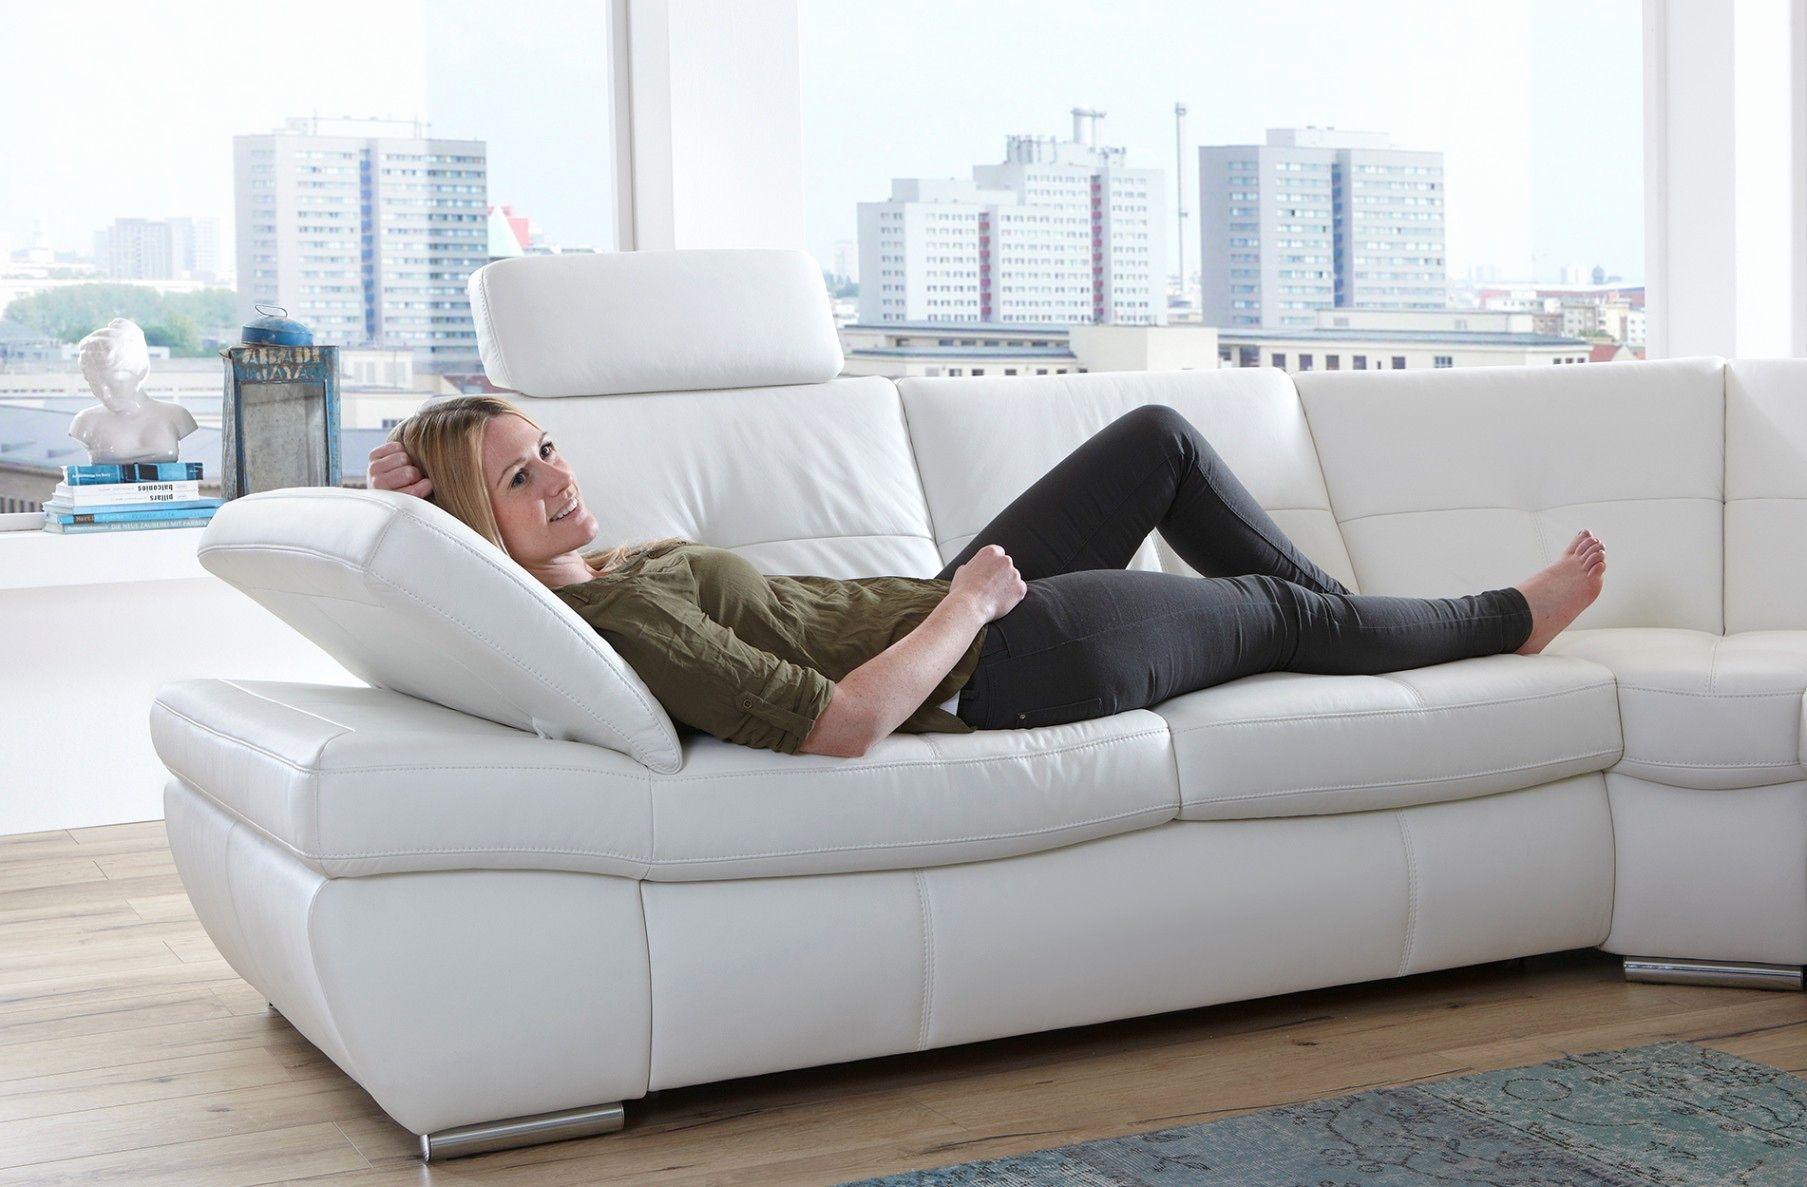 Unique Leather Sectional Sleeper Sofa Photos Salzburg Sectional